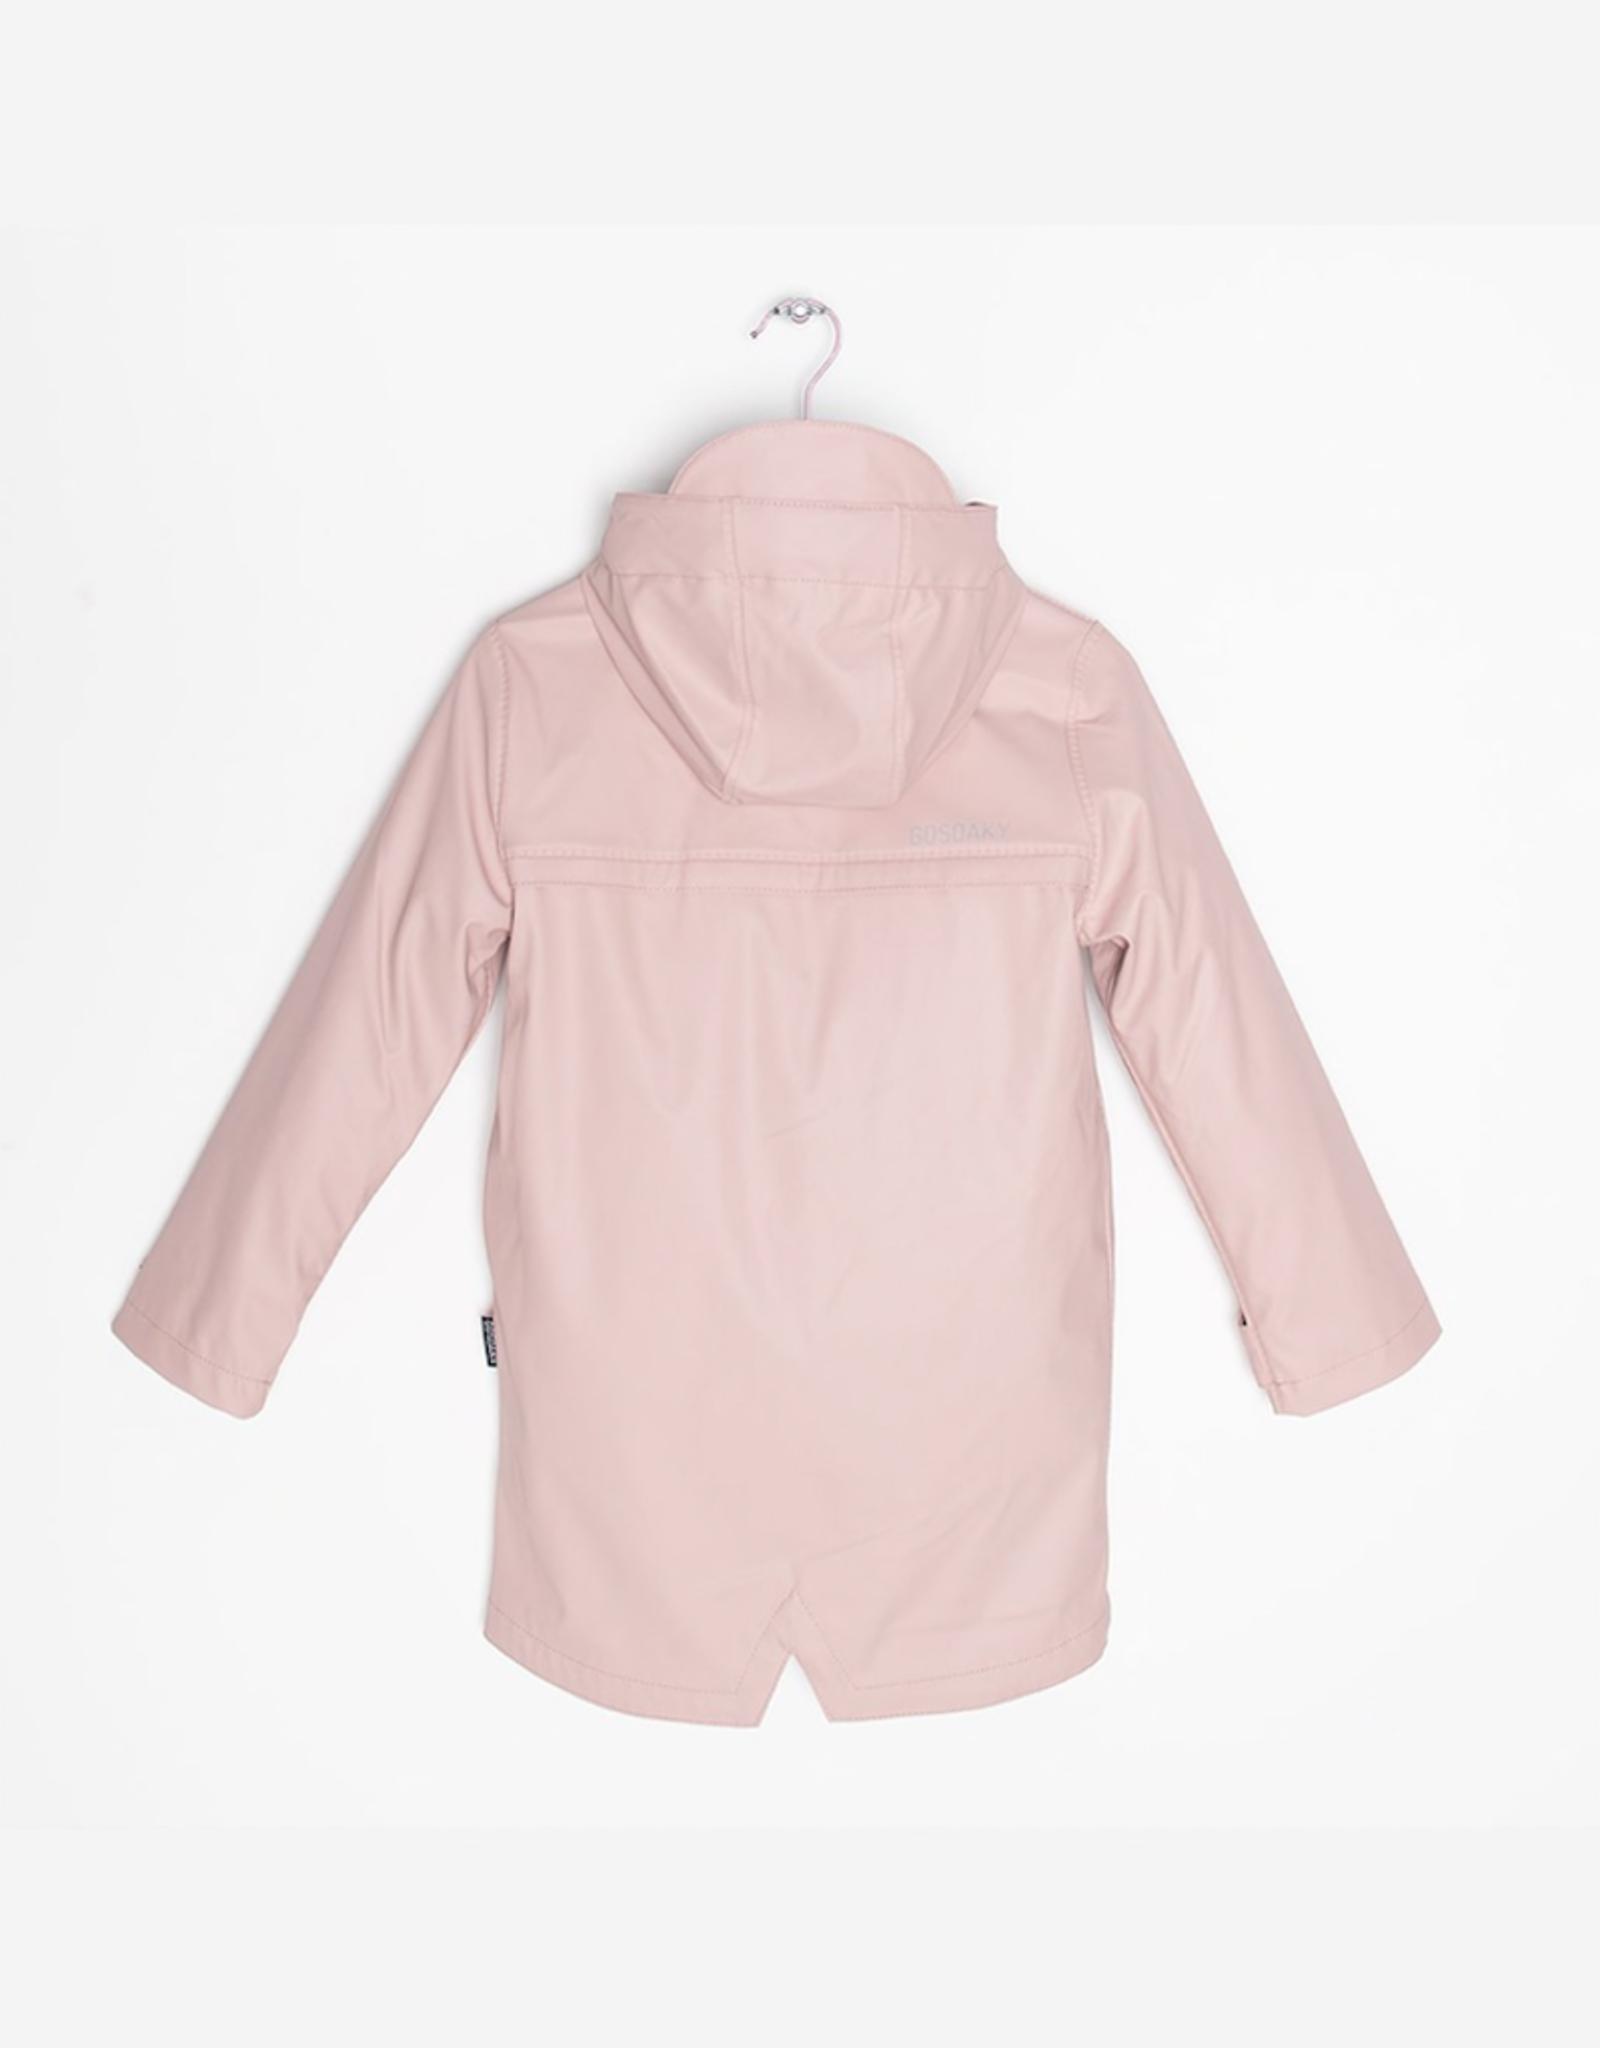 Go Soaky Lazy Geese Raincoat Unisex Lined Raincoat in Evening Pink